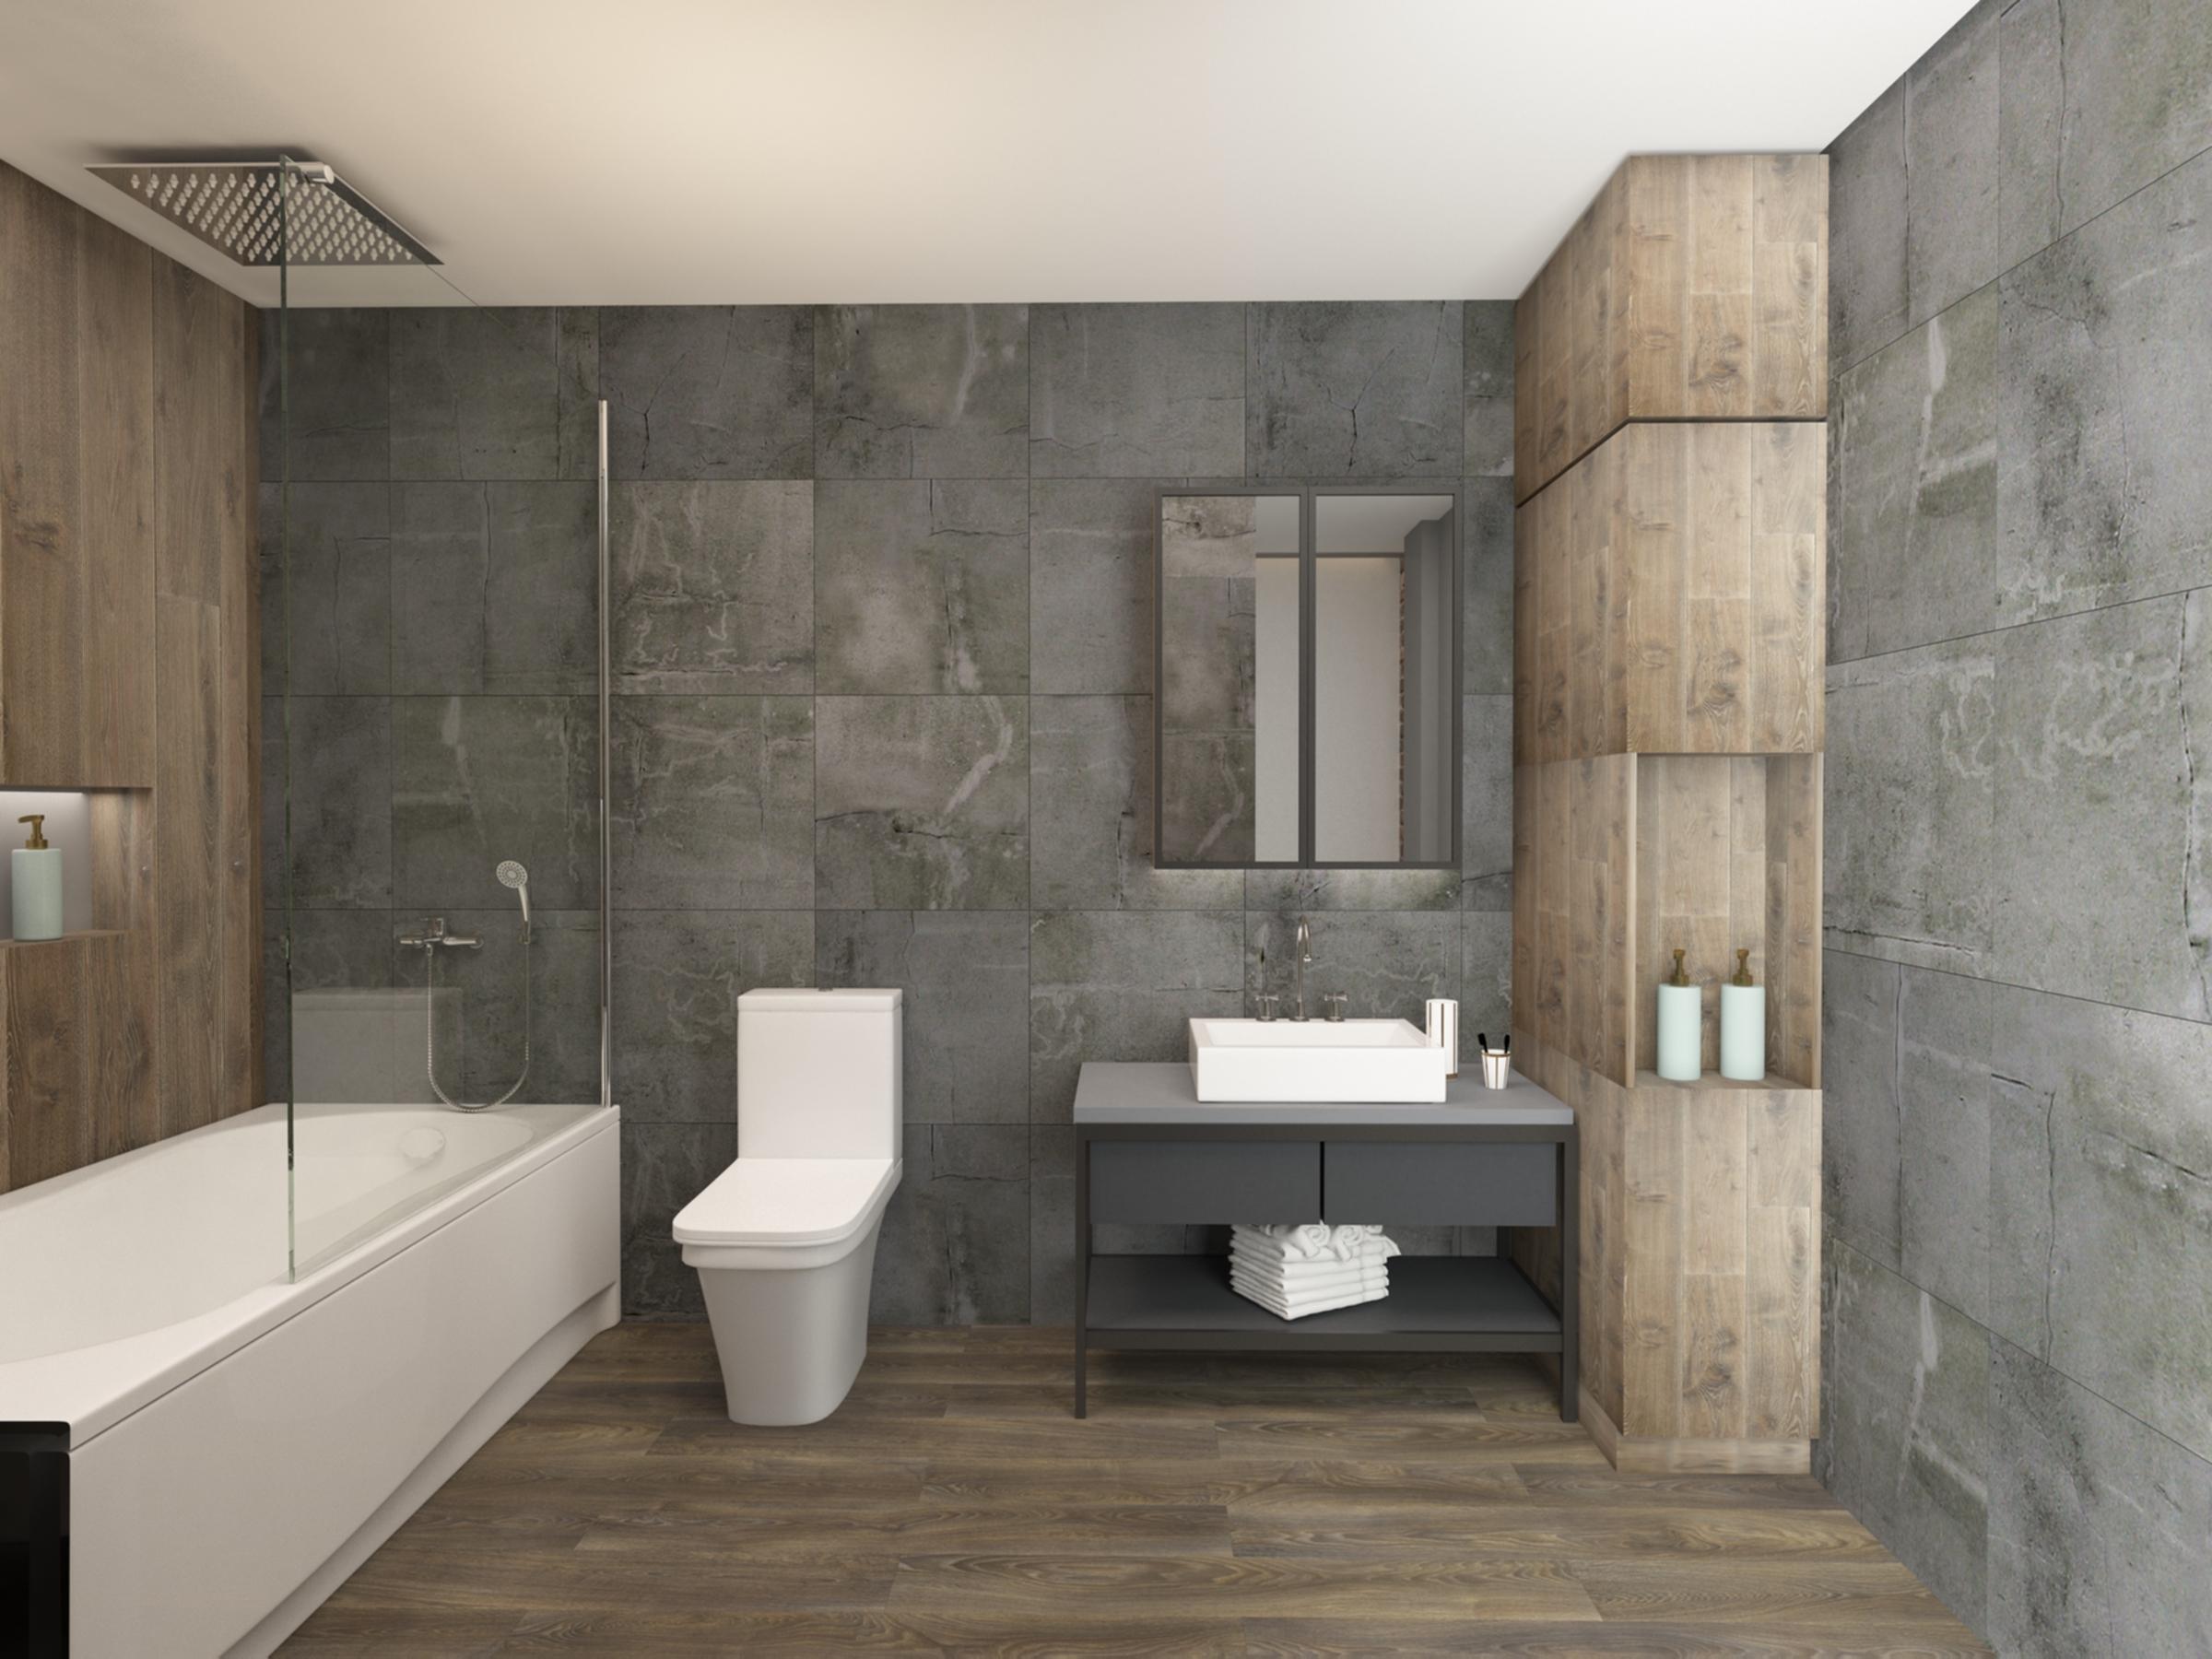 Master bathroom in Apartment for Sale at Baraka Residence in Nyarutarama, Kigali